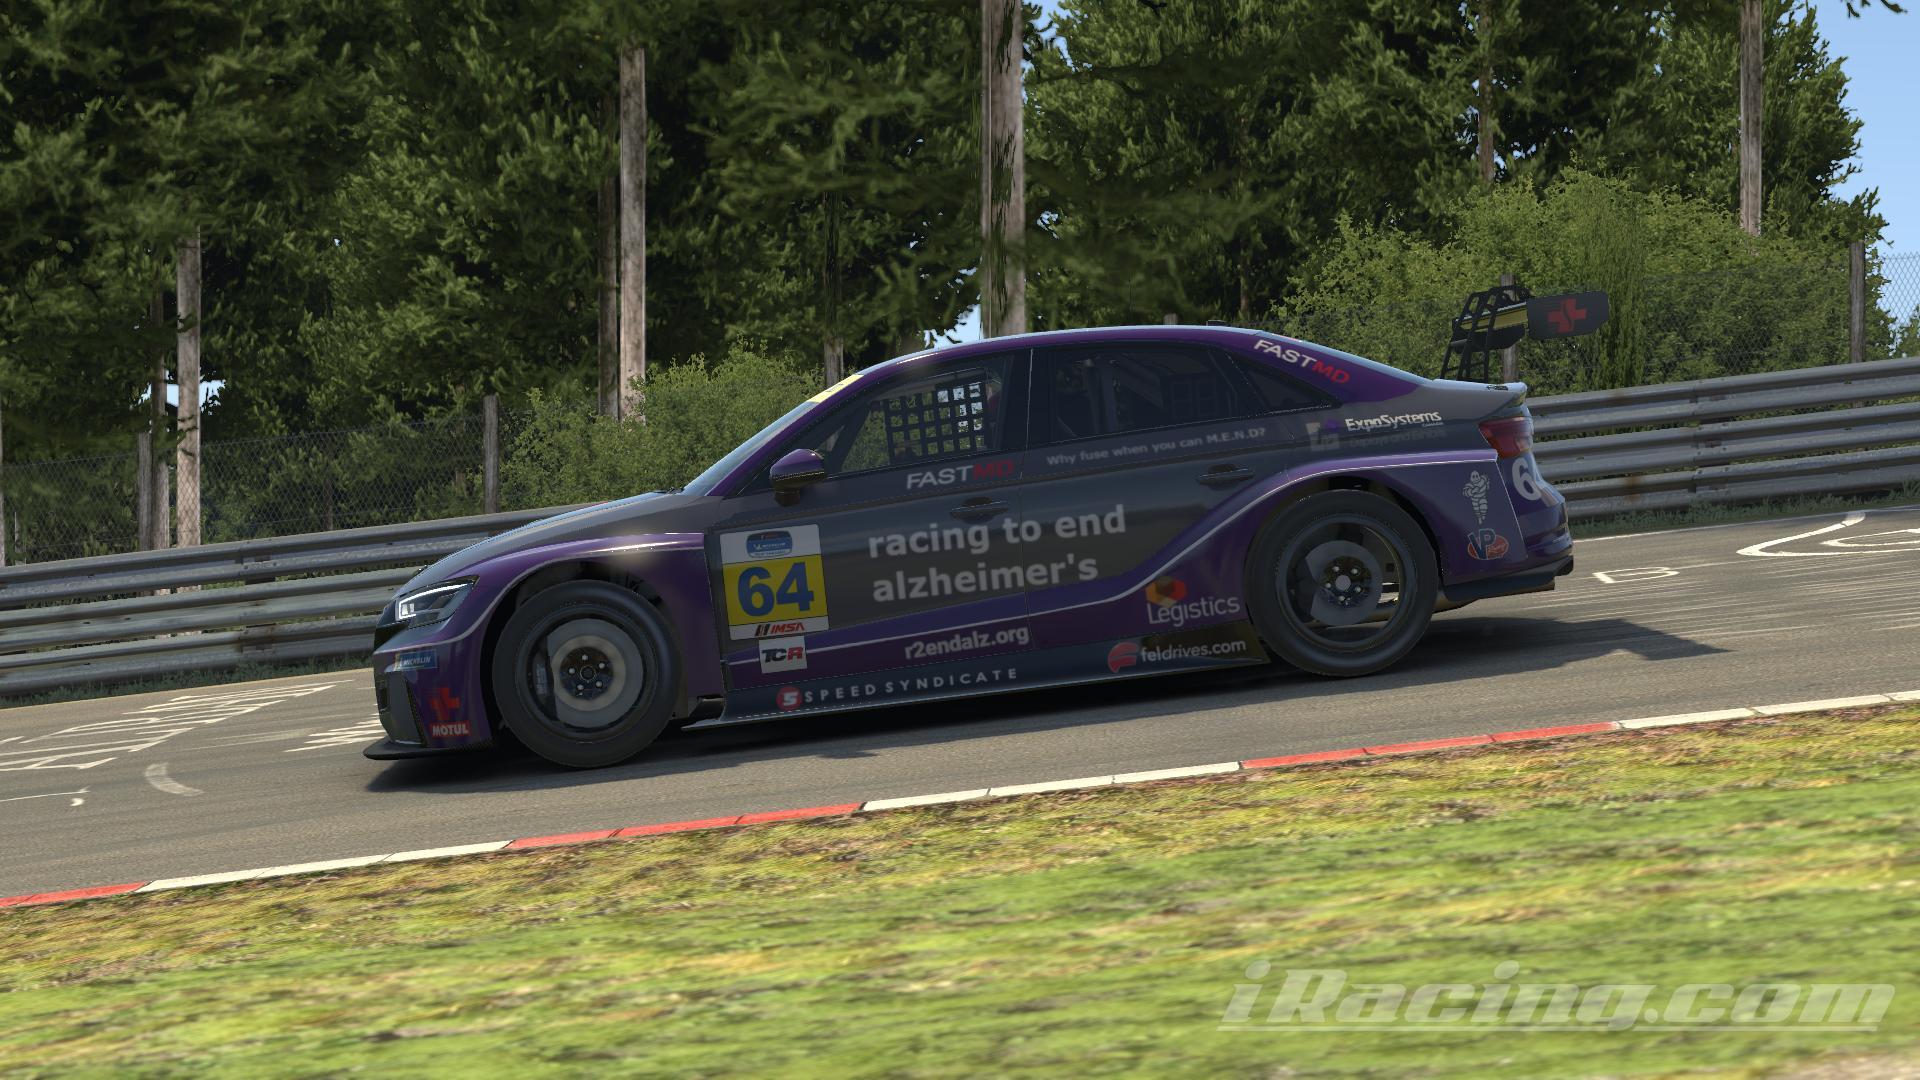 Preview of Fast MD Racing by Vincent Van der Heyden